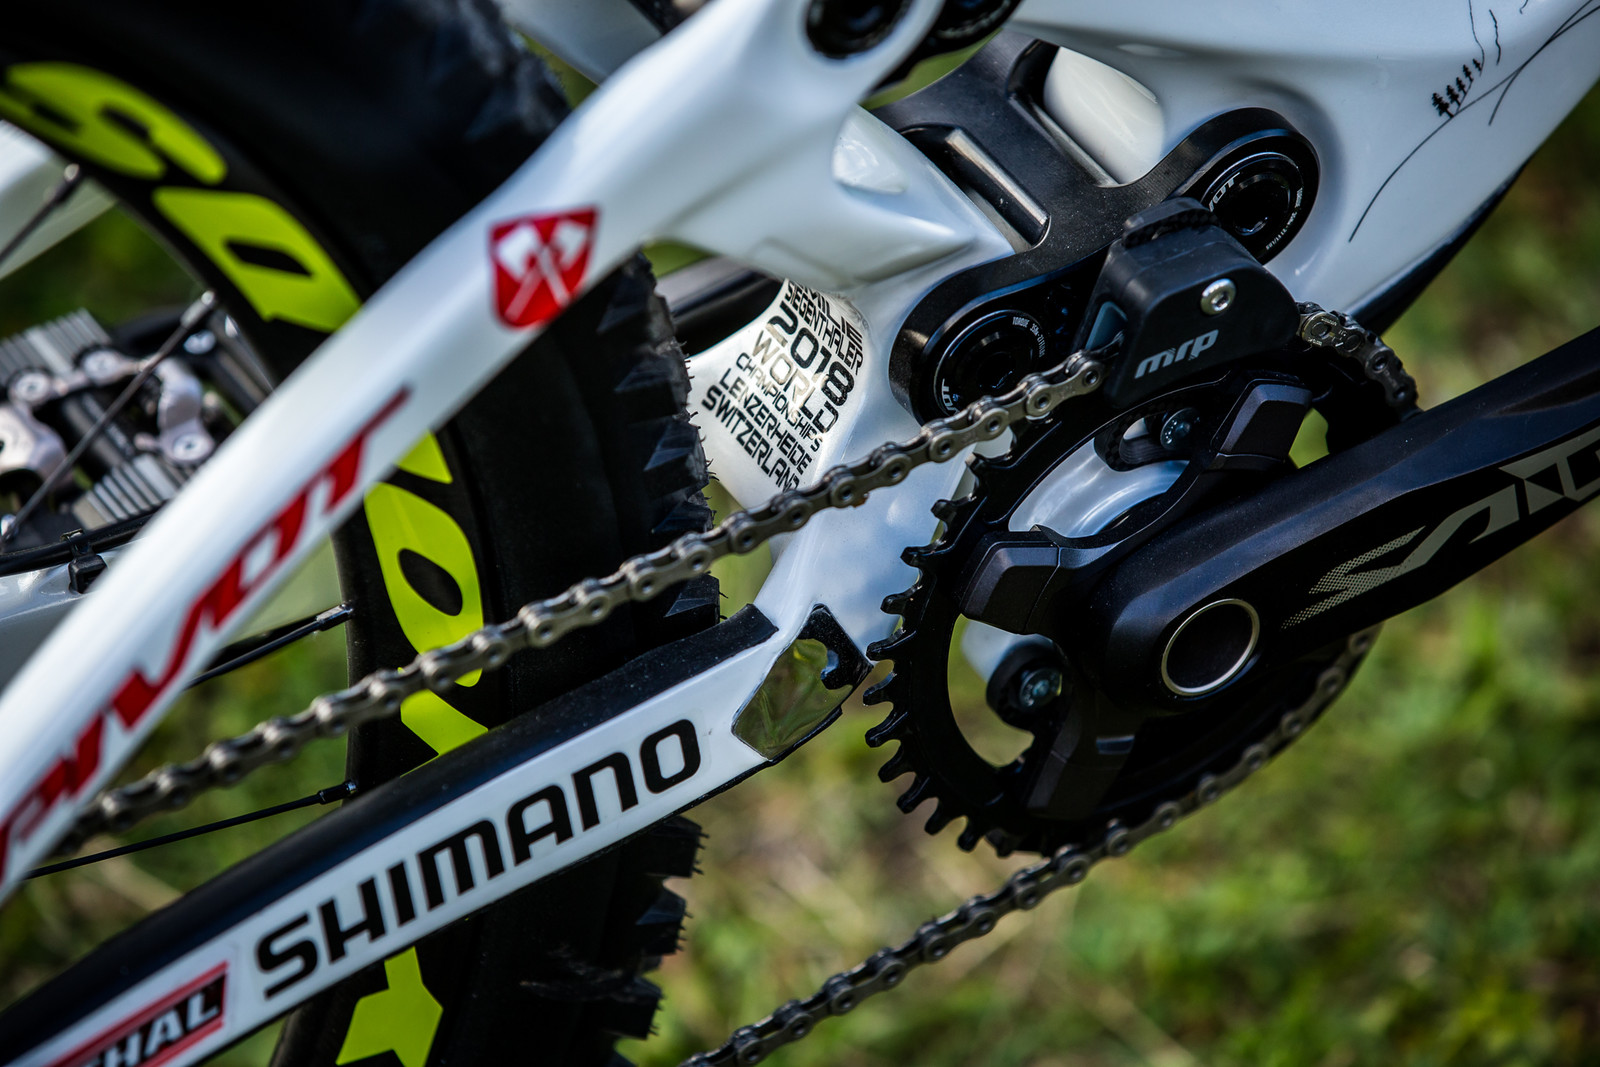 Details - WORLD CHAMPS BIKE - Emilie Siegenthaler's Pivot Phoenix - Mountain Biking Pictures - Vital MTB